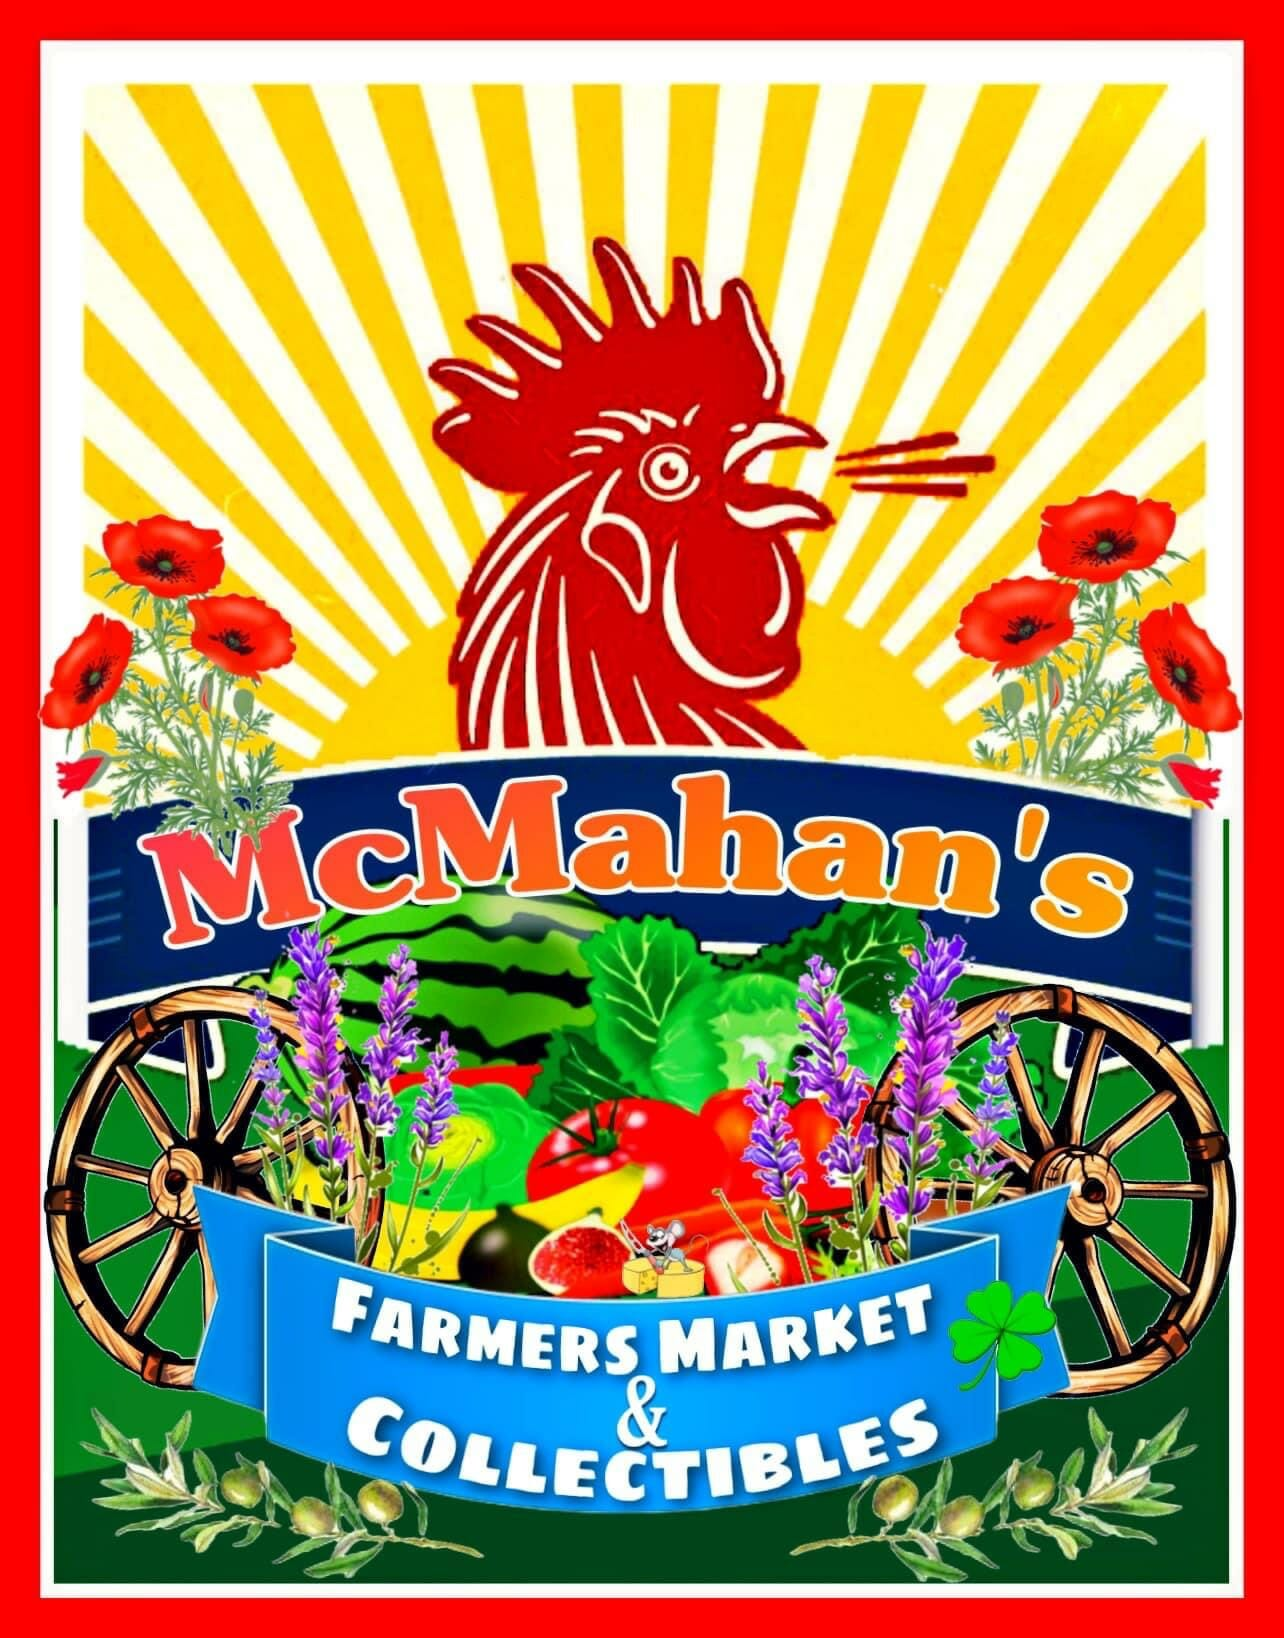 McMahan's Farmers Market & Collectibles